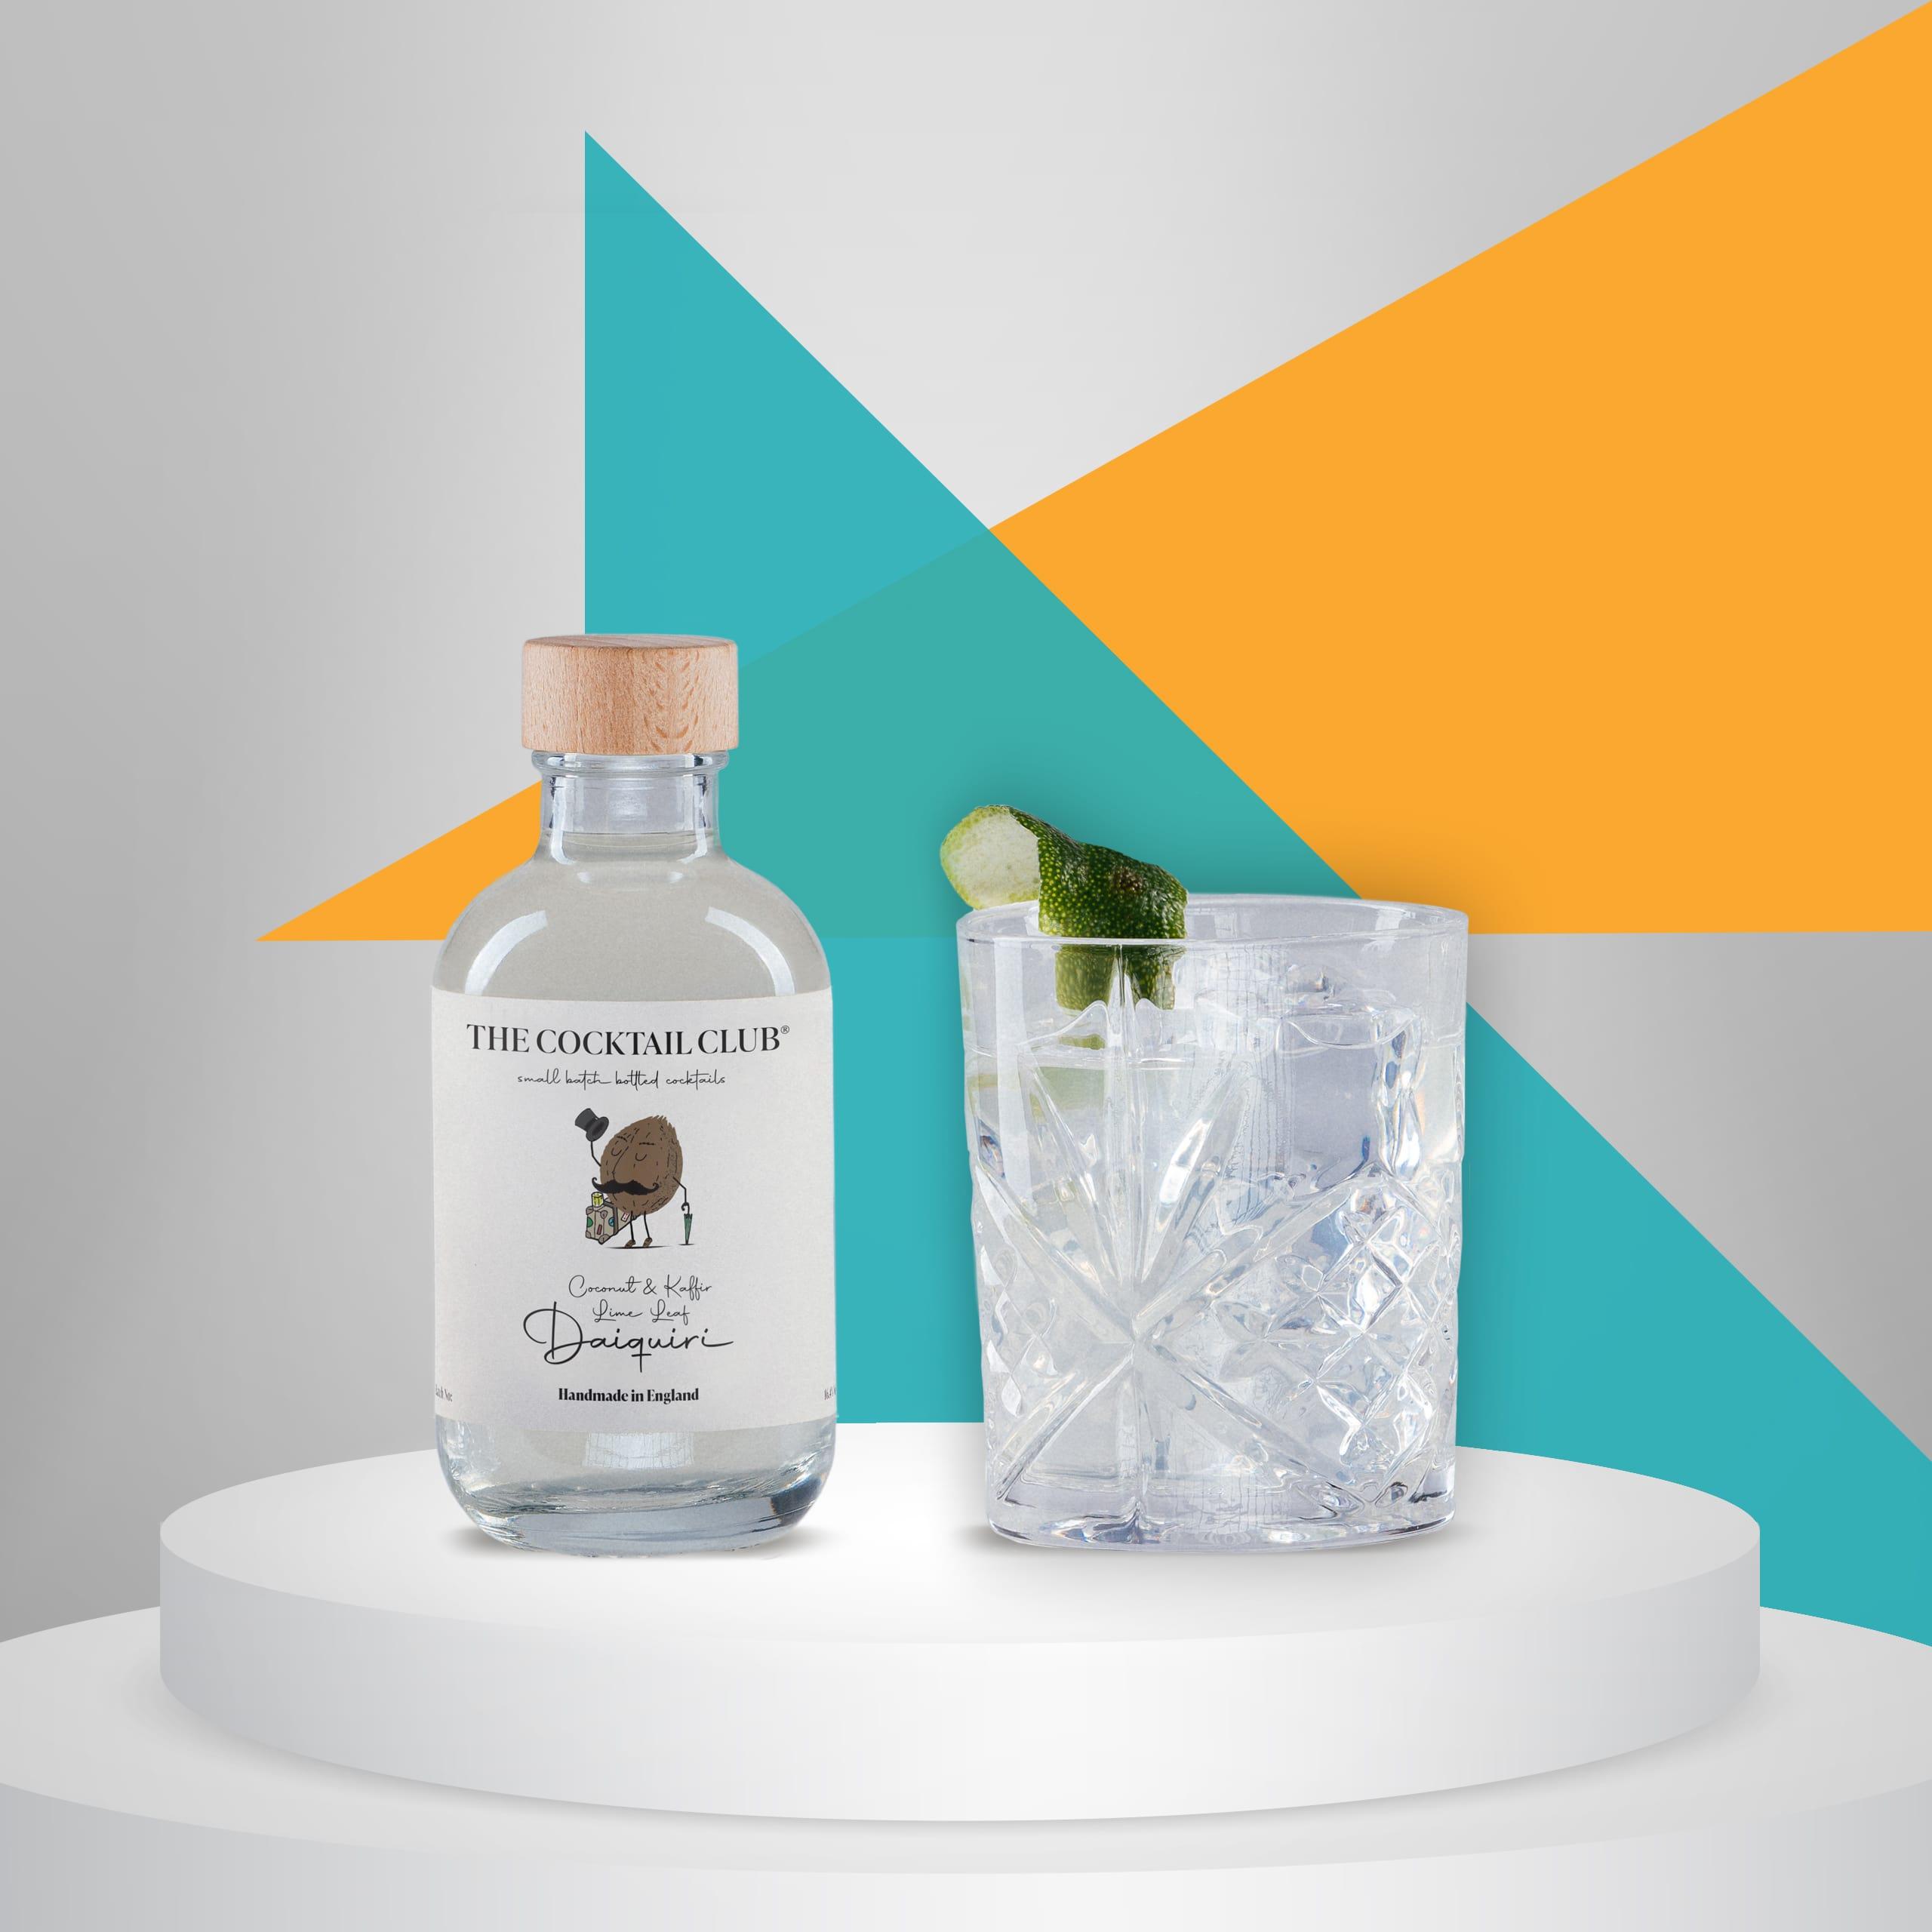 daiquiri-bottled-cocktail